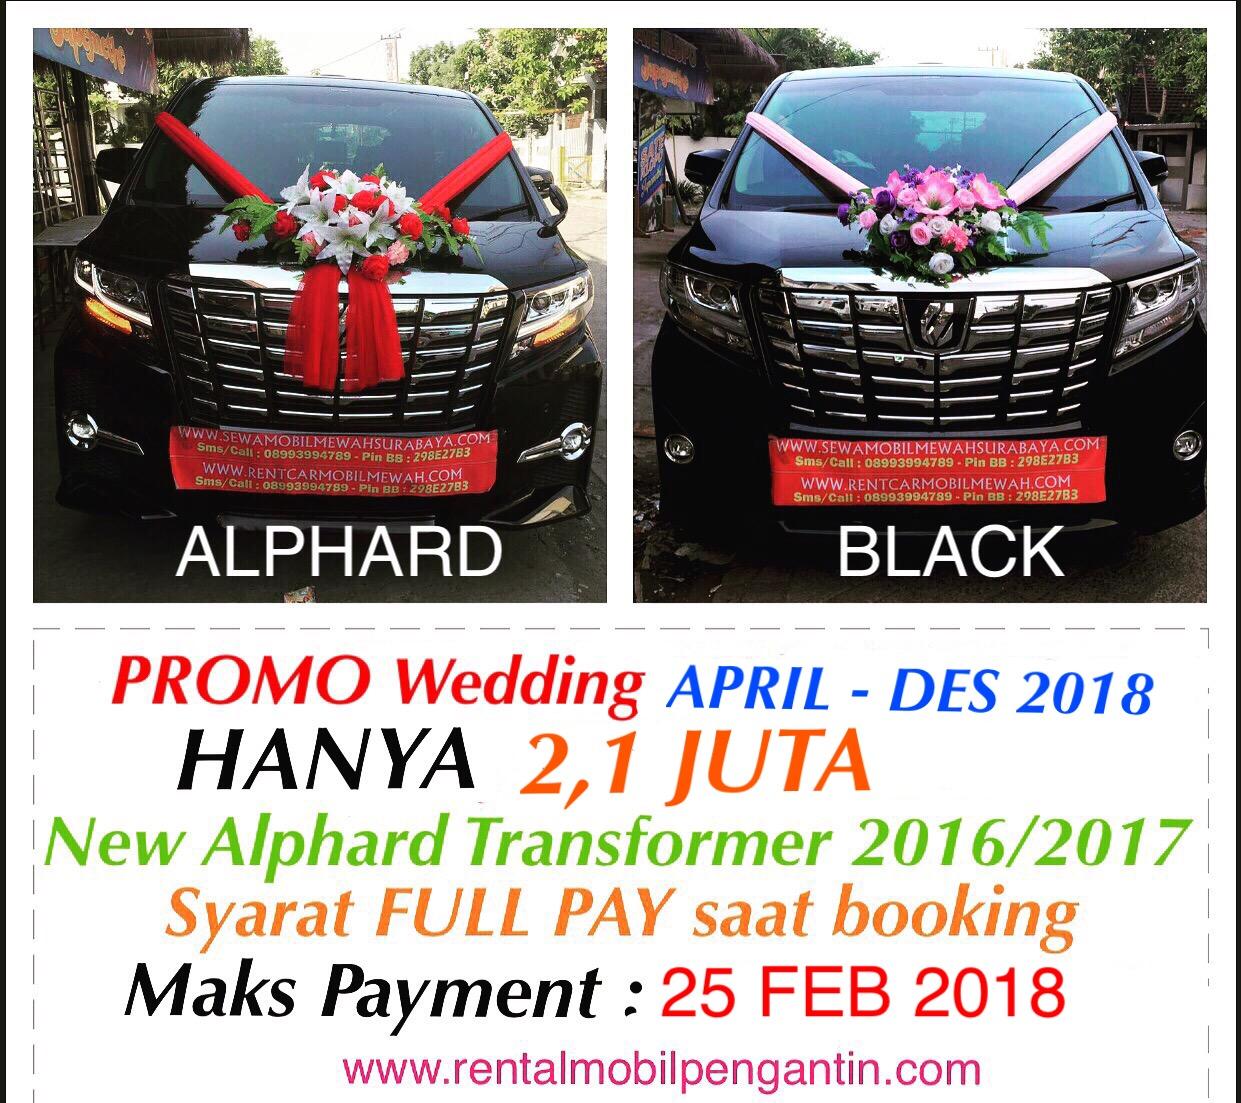 rental mobil mewah murah alphard vellfire wedding surabaya